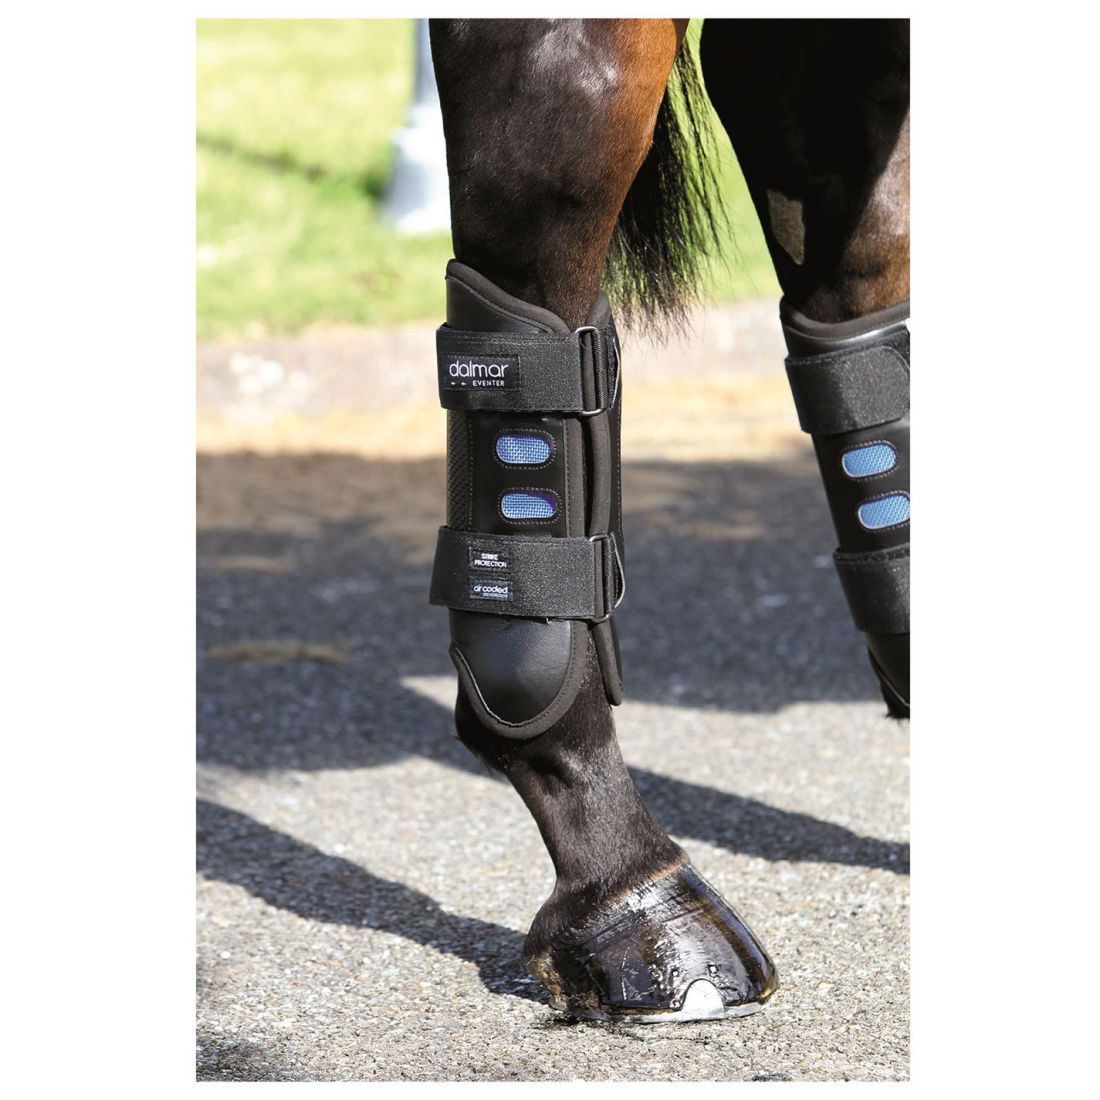 Dalmar Eventer Hind Boot Unisex Horse Legwear Warm